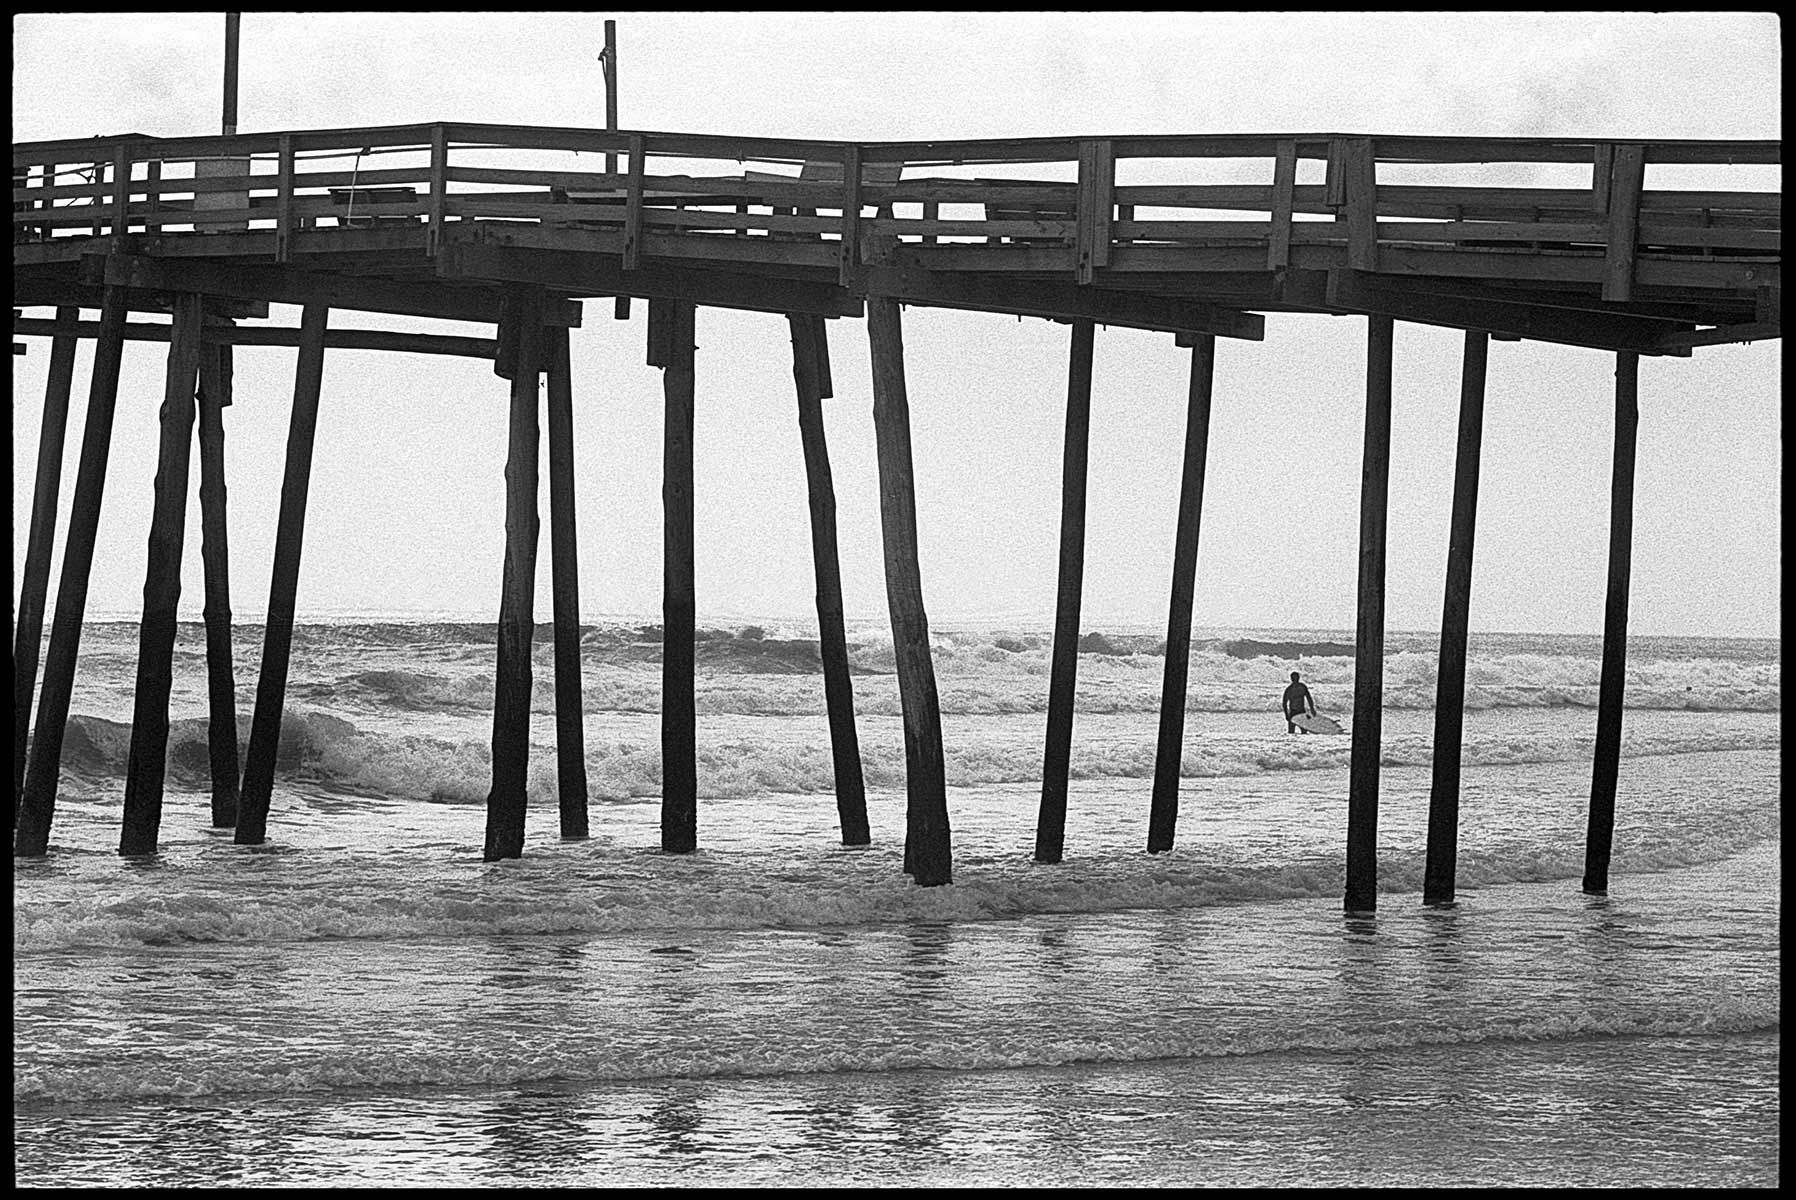 Nags Head, North Carolina, Surfing, Nags Head Pier, b&w, film, surfer